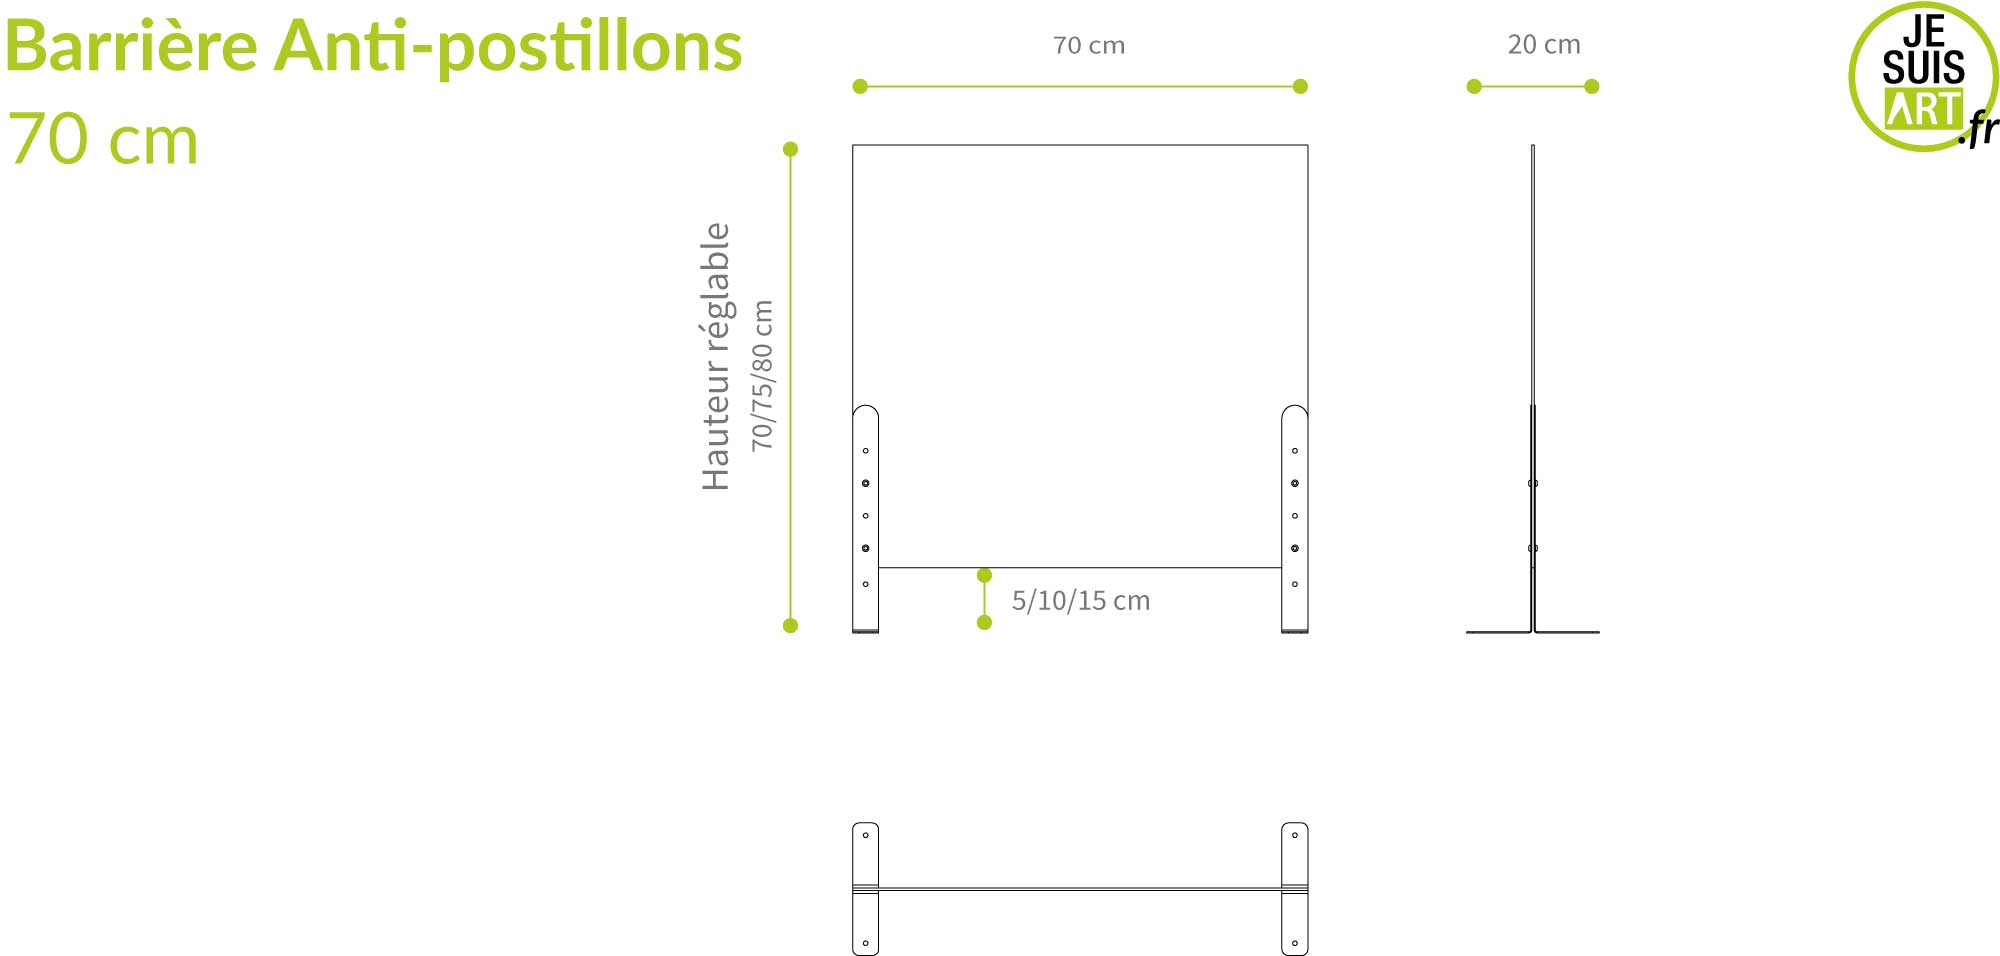 Barrières Anti-postillons 70x80 cm